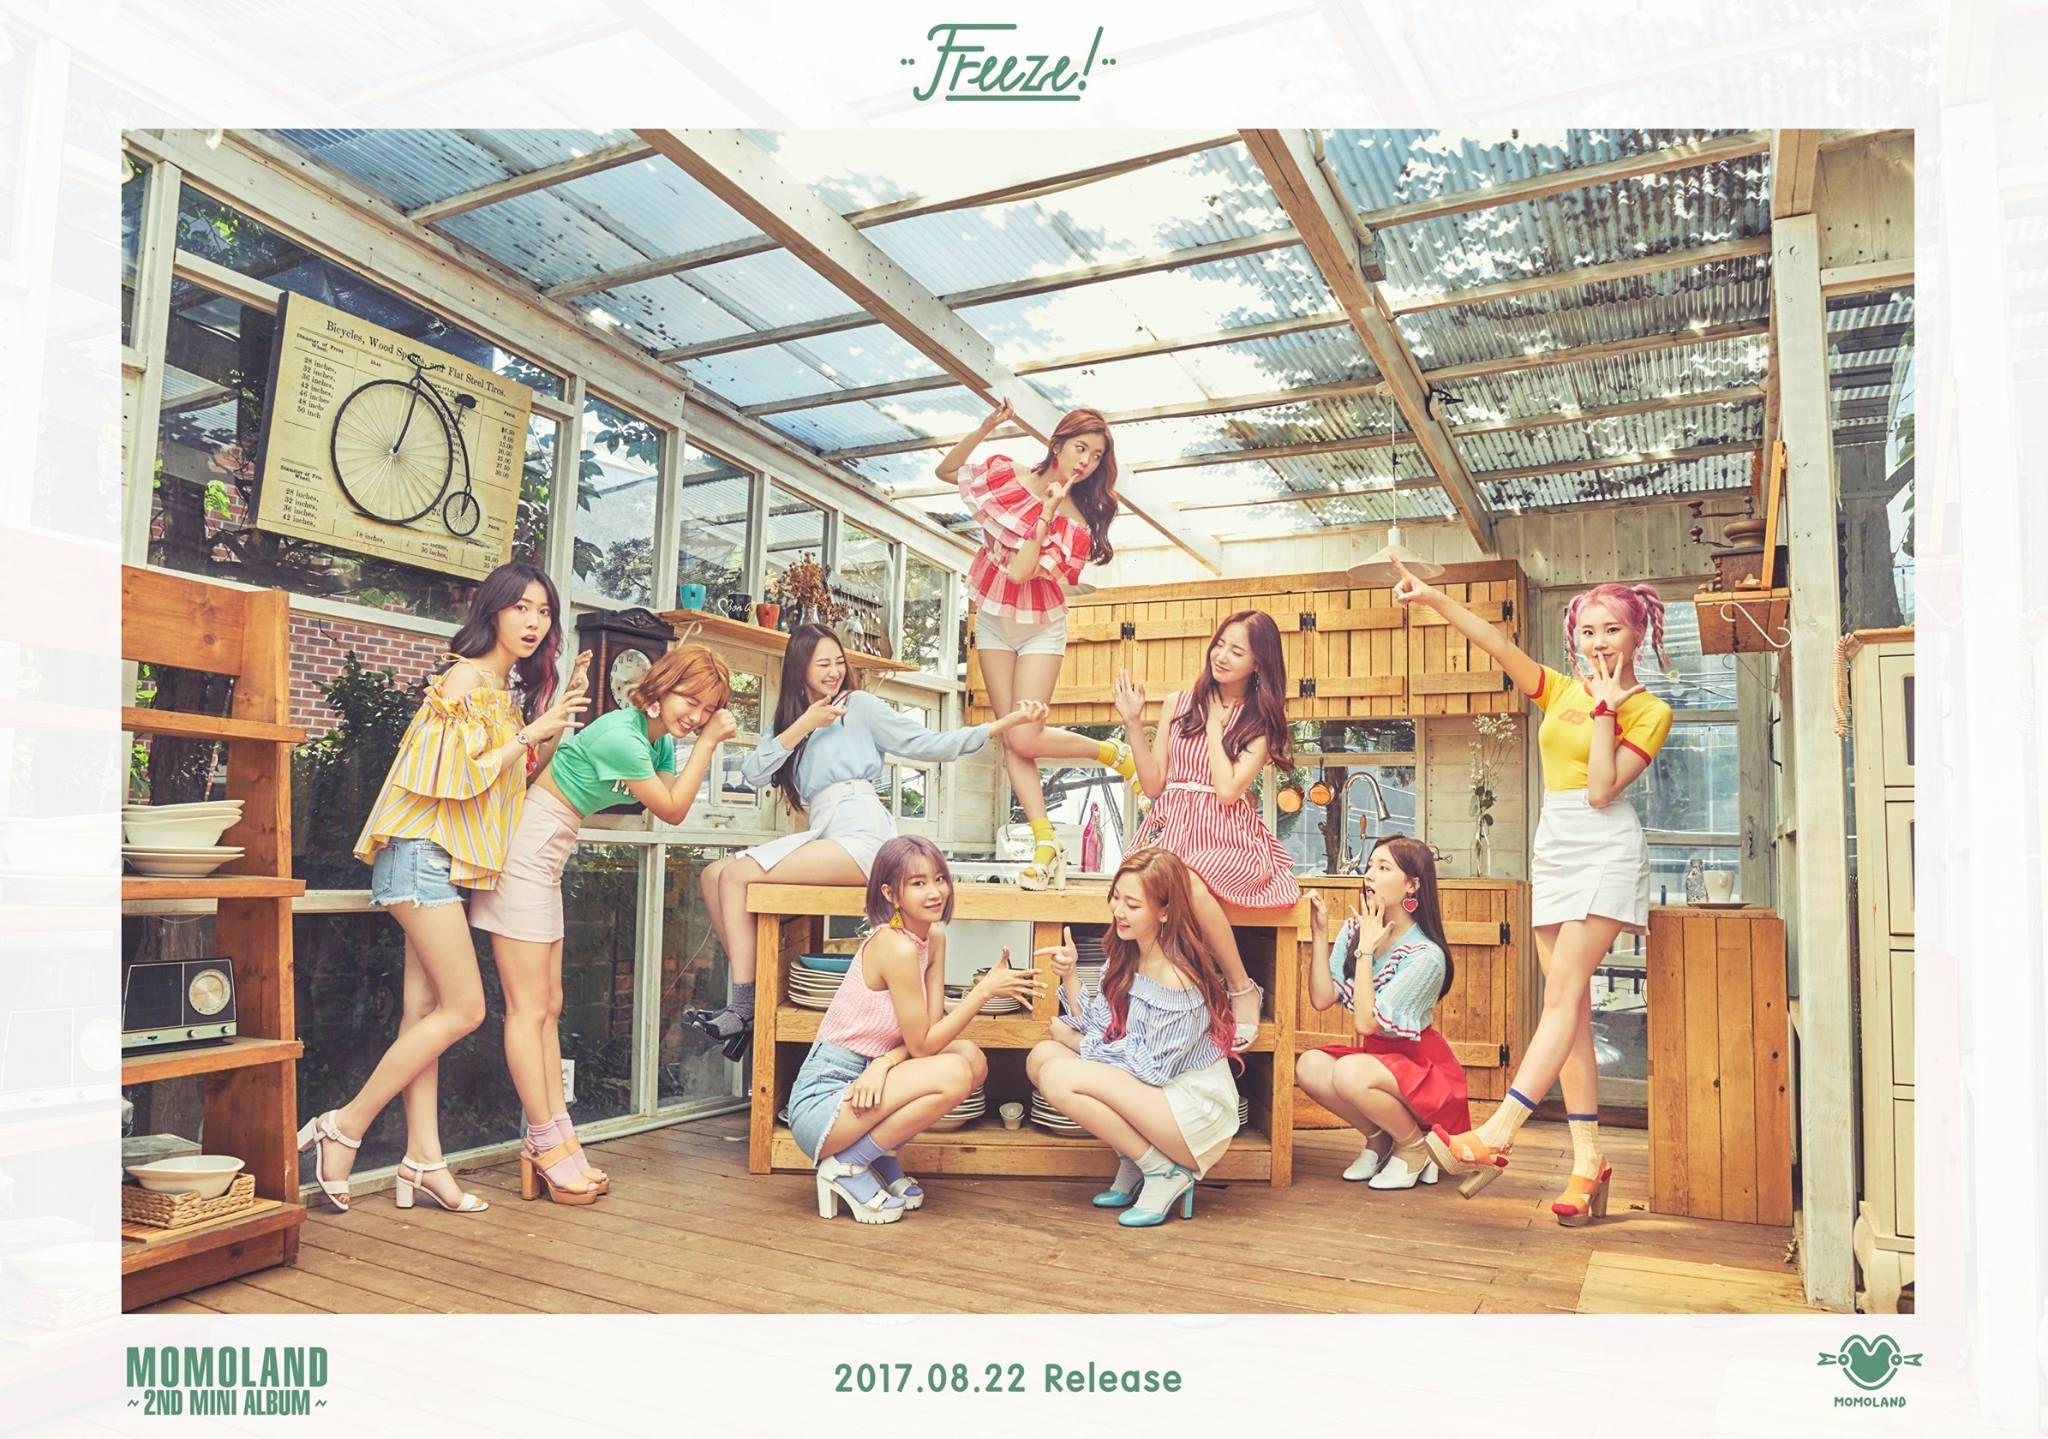 Teaser Momoland 2nd Mini Album Freeze Teaser Image 2 이미지 포함 데이지